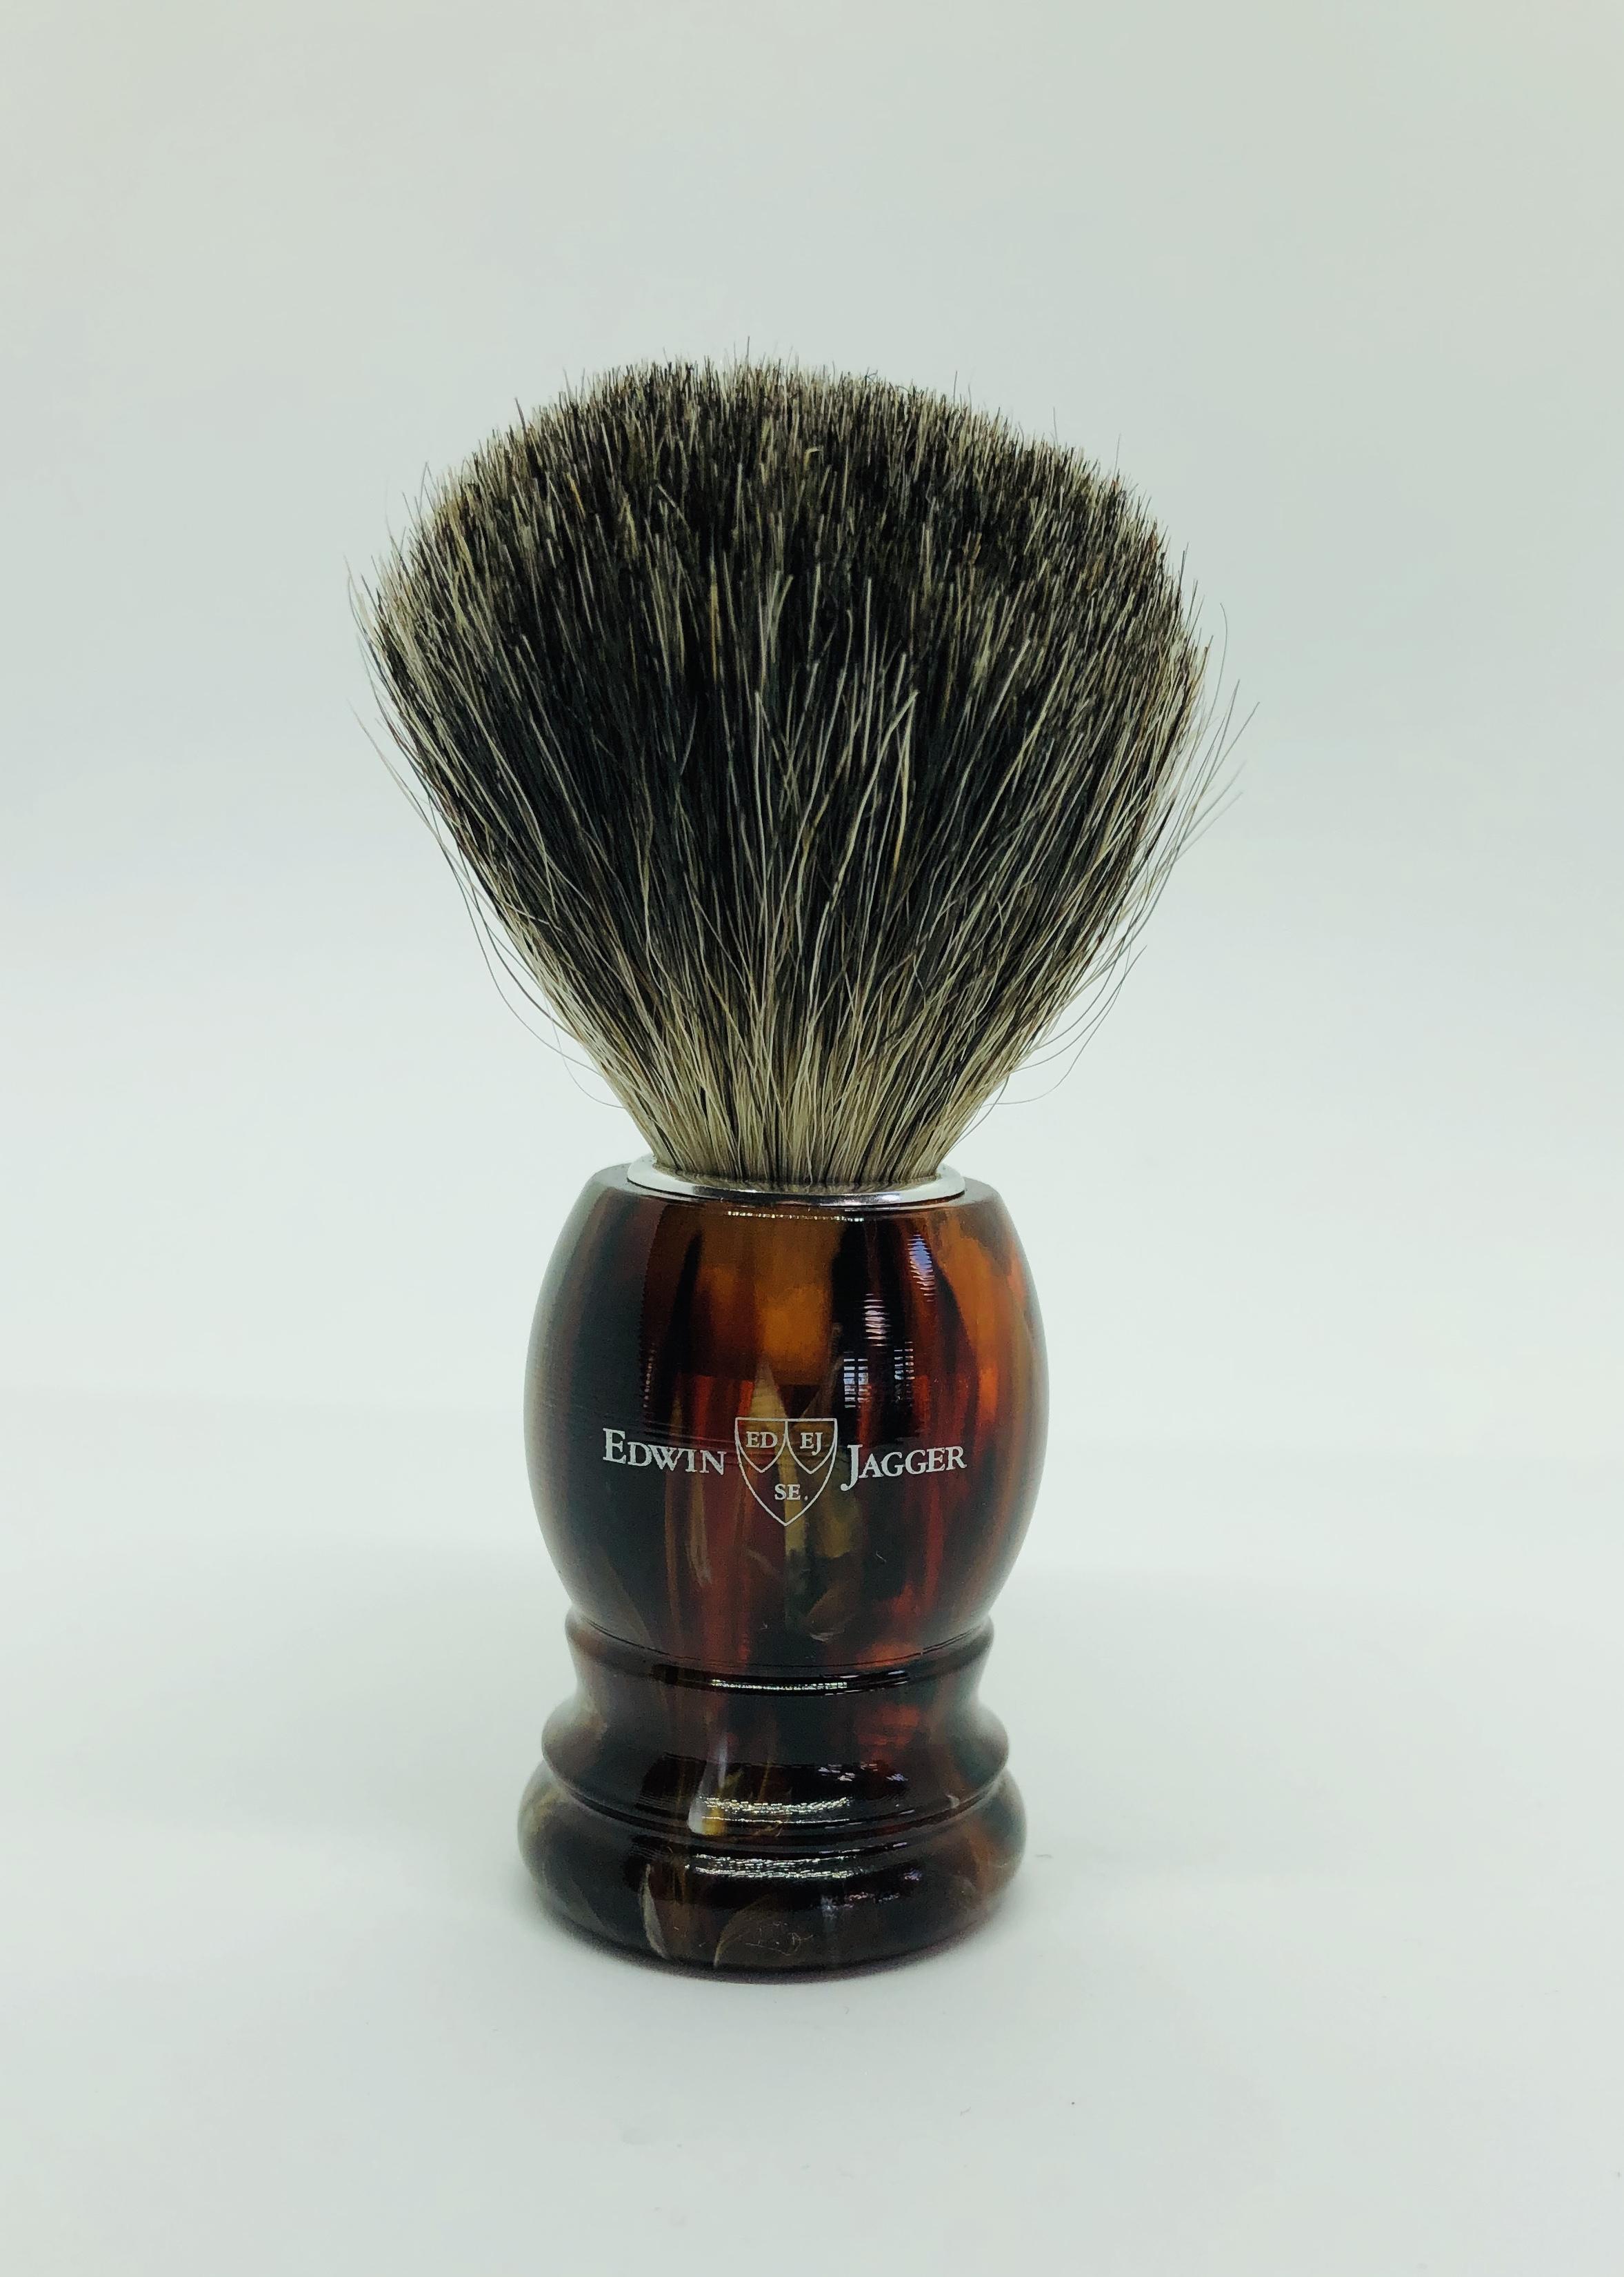 Edwin Jagger brush pure badger (no chrome)